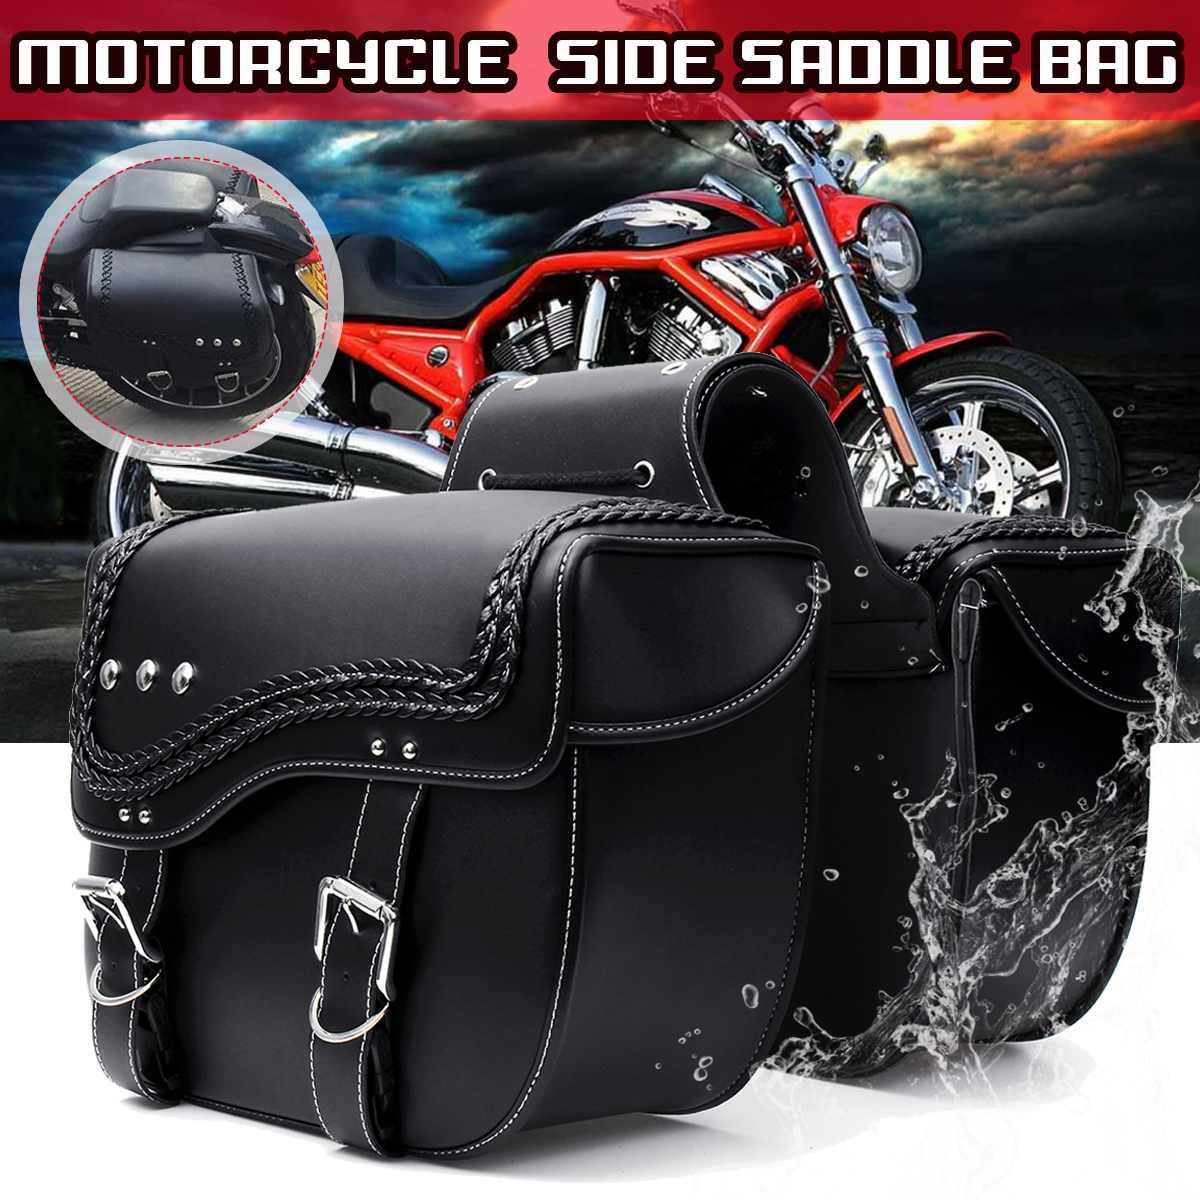 Motorcycle Black Bobber PU Leather Side Tool Bag Luggage Saddlebag Storage Pair